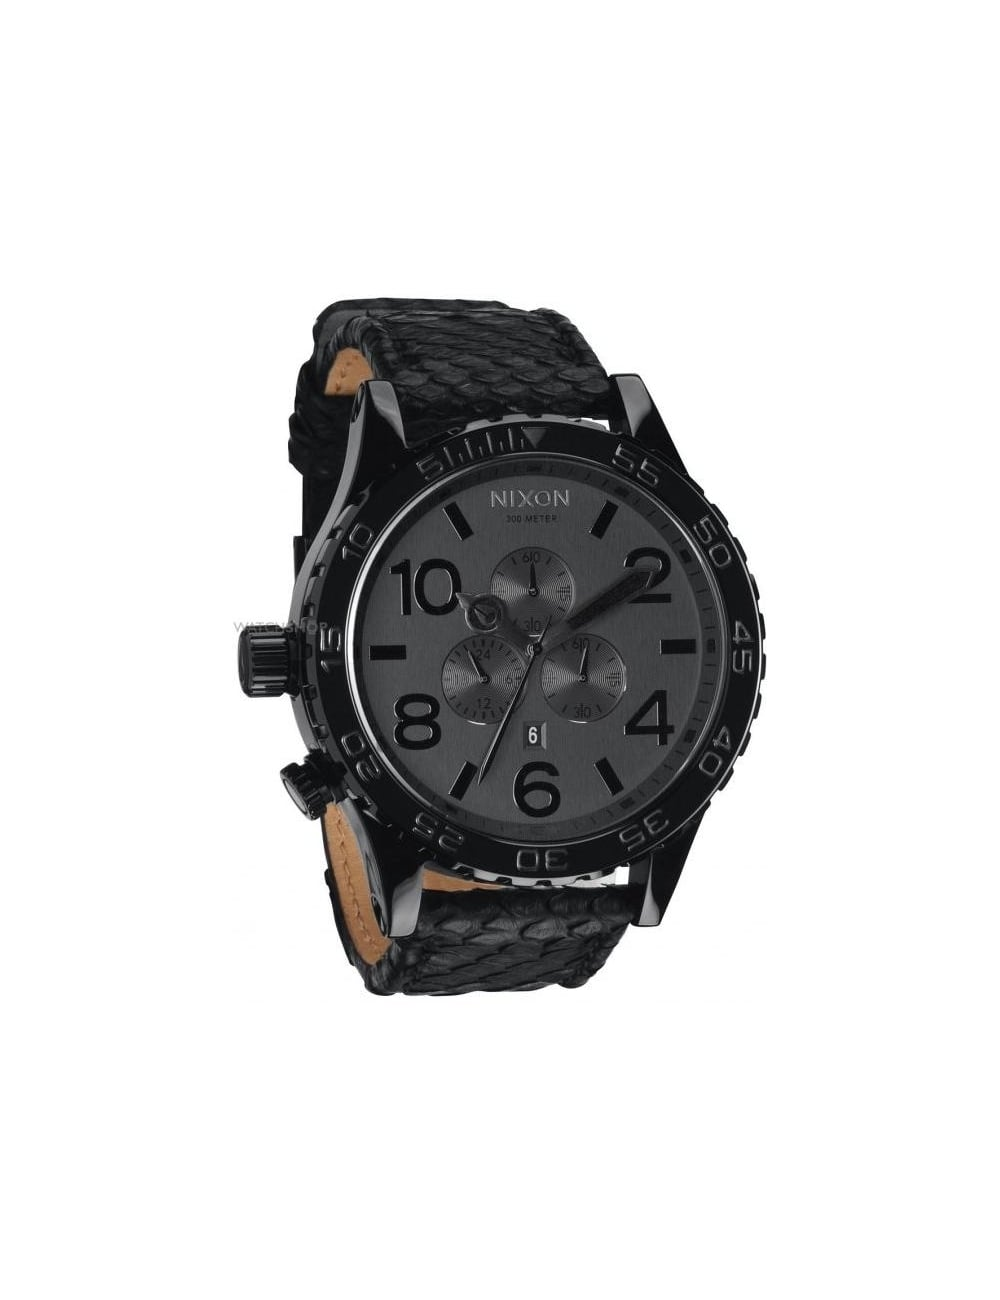 Home nixon nixon 51 30 chrono leather watch black snakeskin